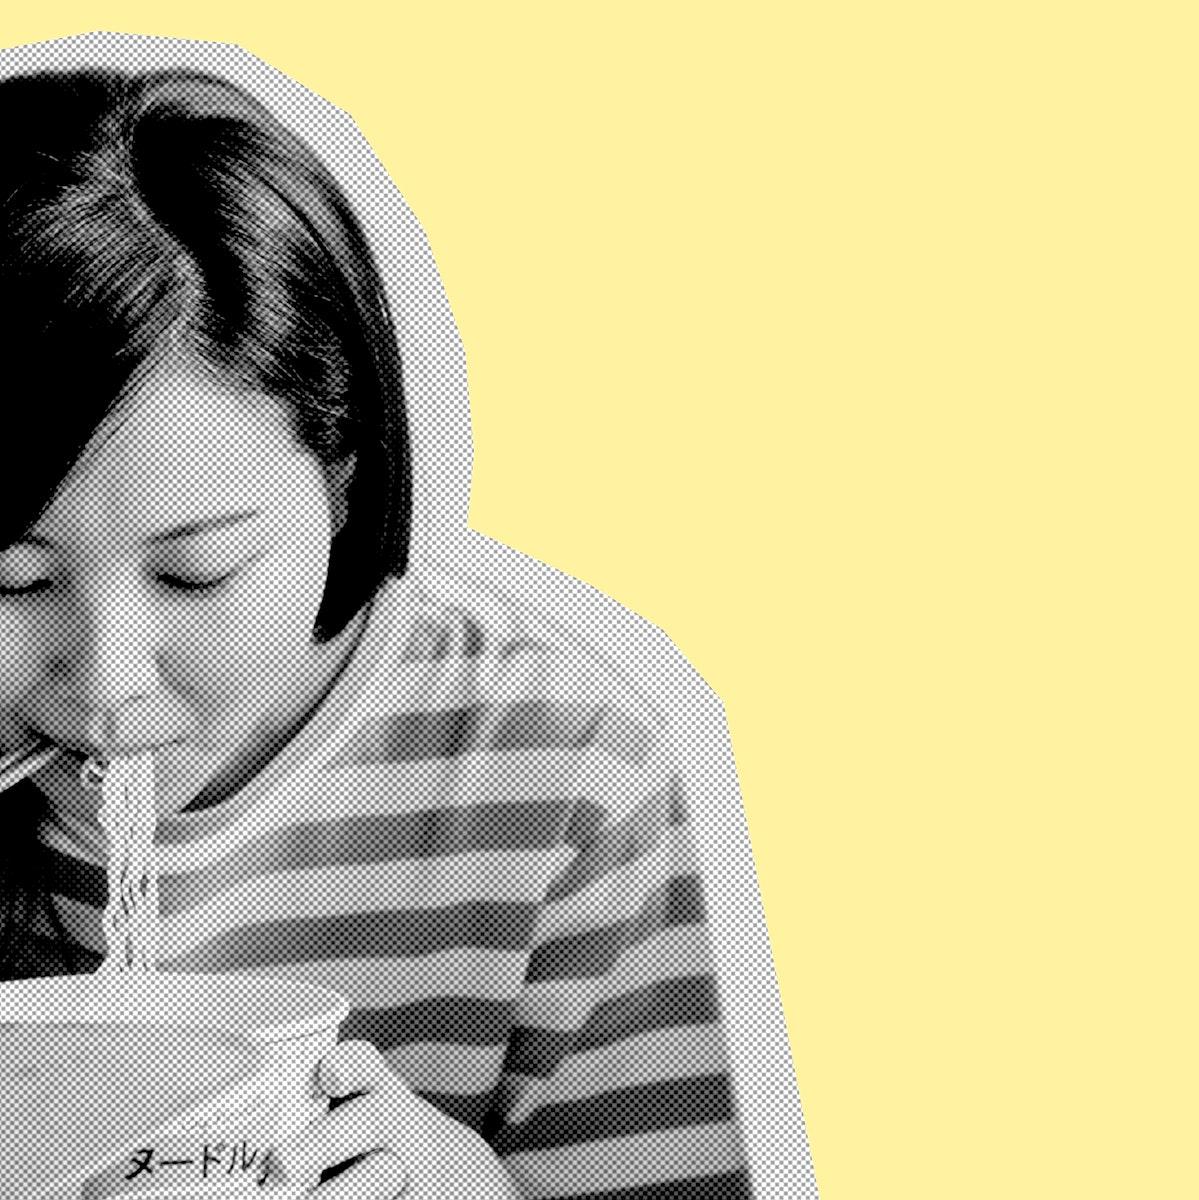 Asian woman eating instant noodles during coronavirus quarantine